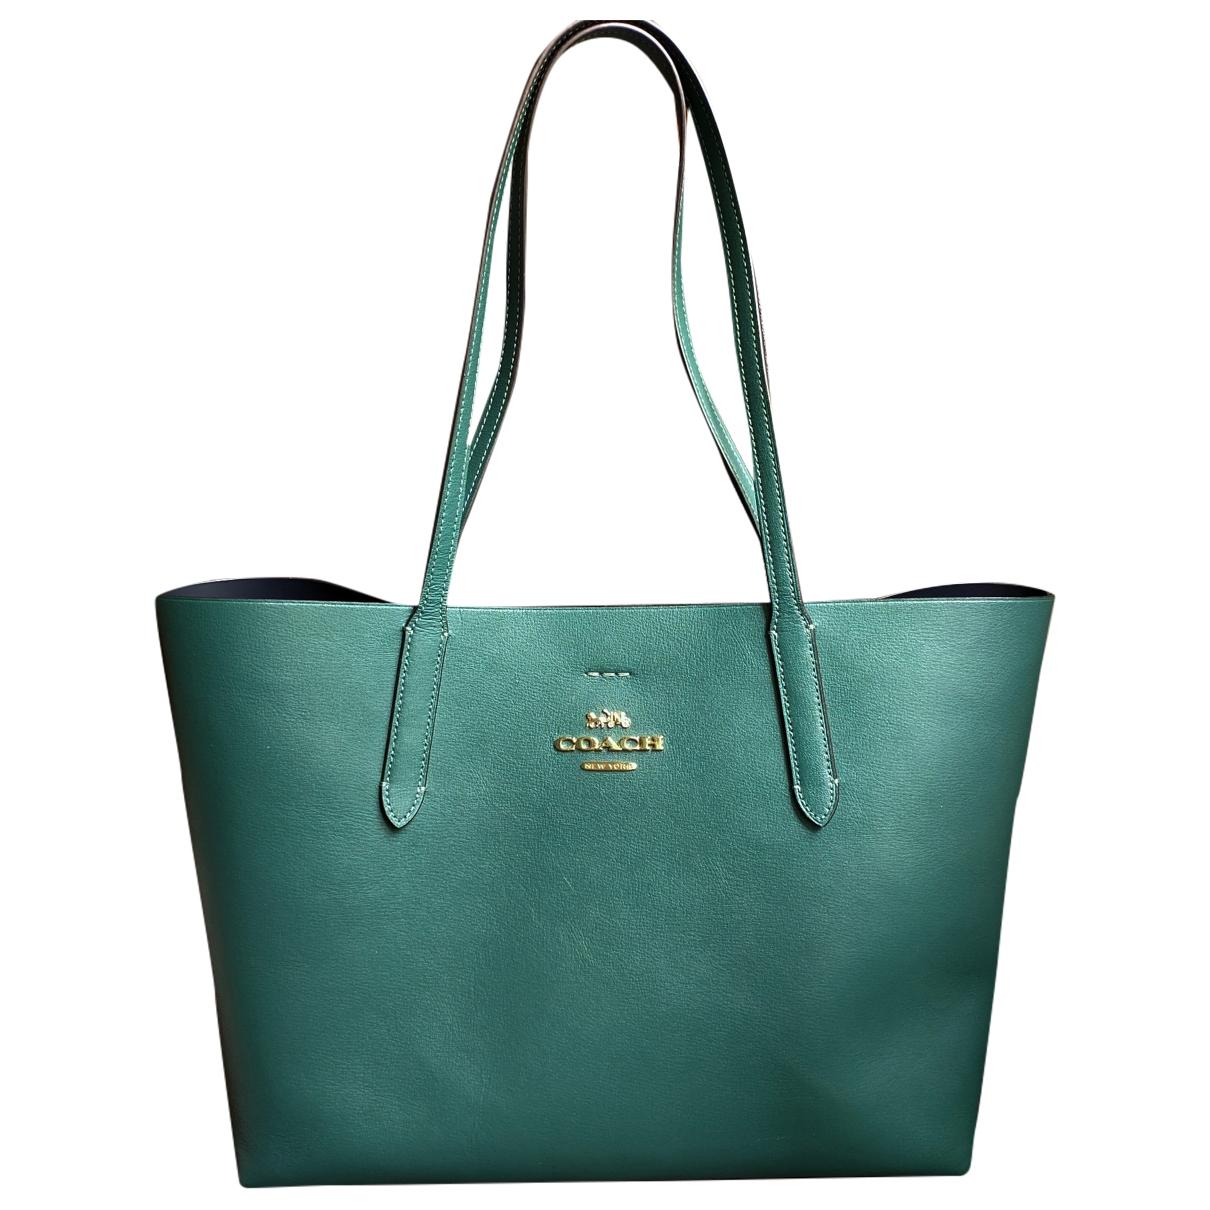 Coach \N Green Leather handbag for Women \N